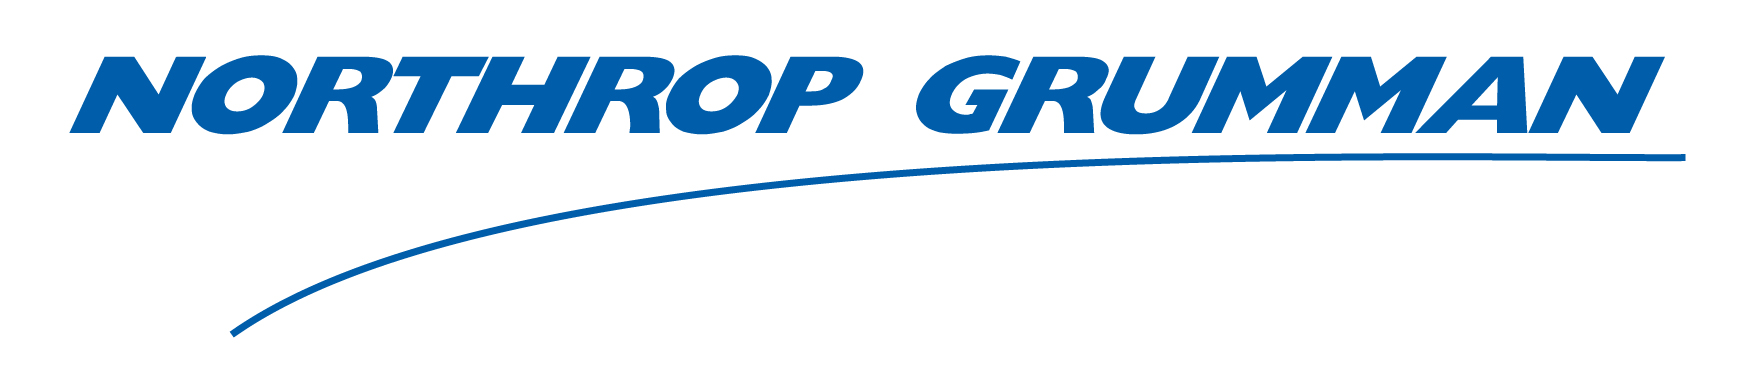 northropgrumman_logo_blue[JPEG]